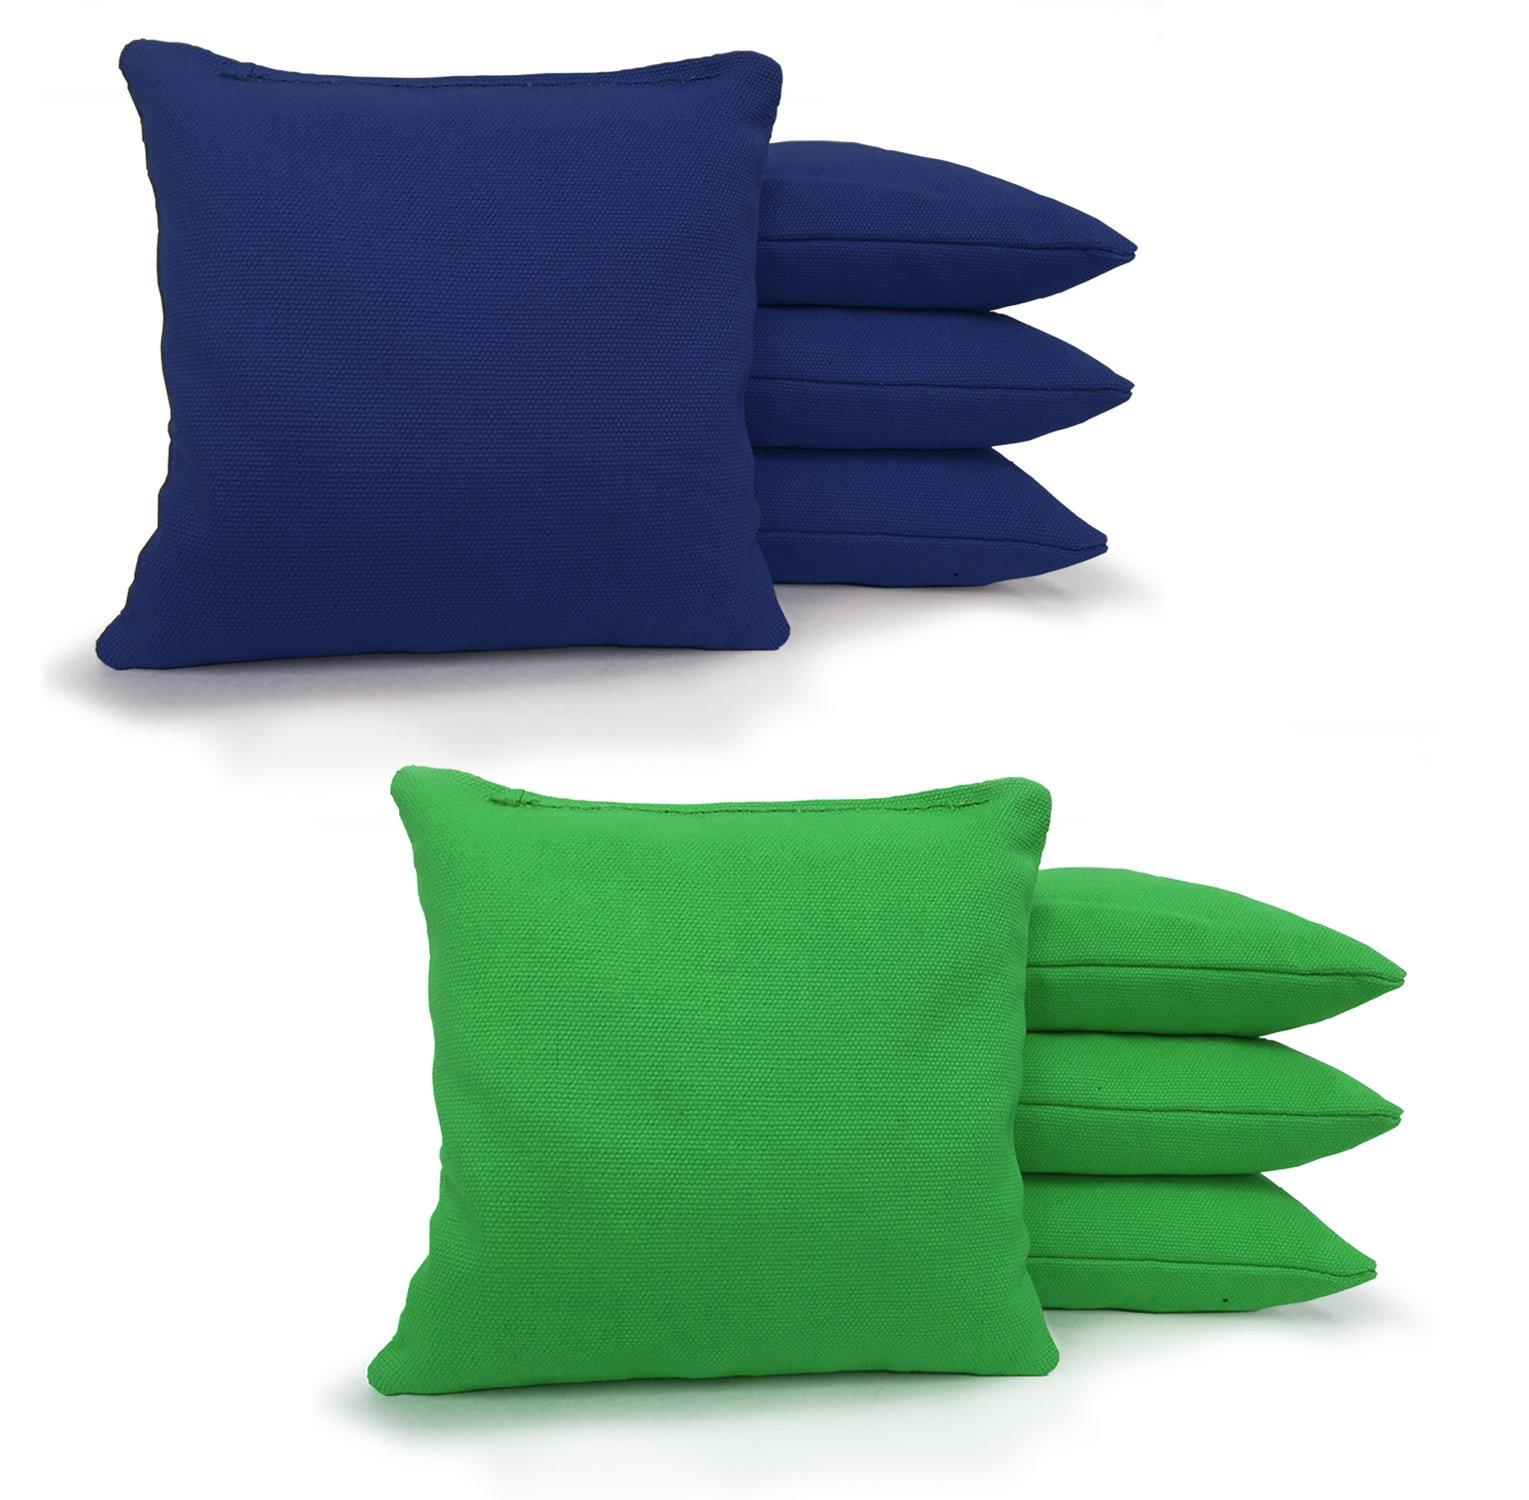 8 Standard Corn Filled Regulation Duck Cloth Cornhole Bags! 17 COLORS (YOU PICK)!! (Kelly Green/Royal Blue) by Johnson Enterprises, LLC